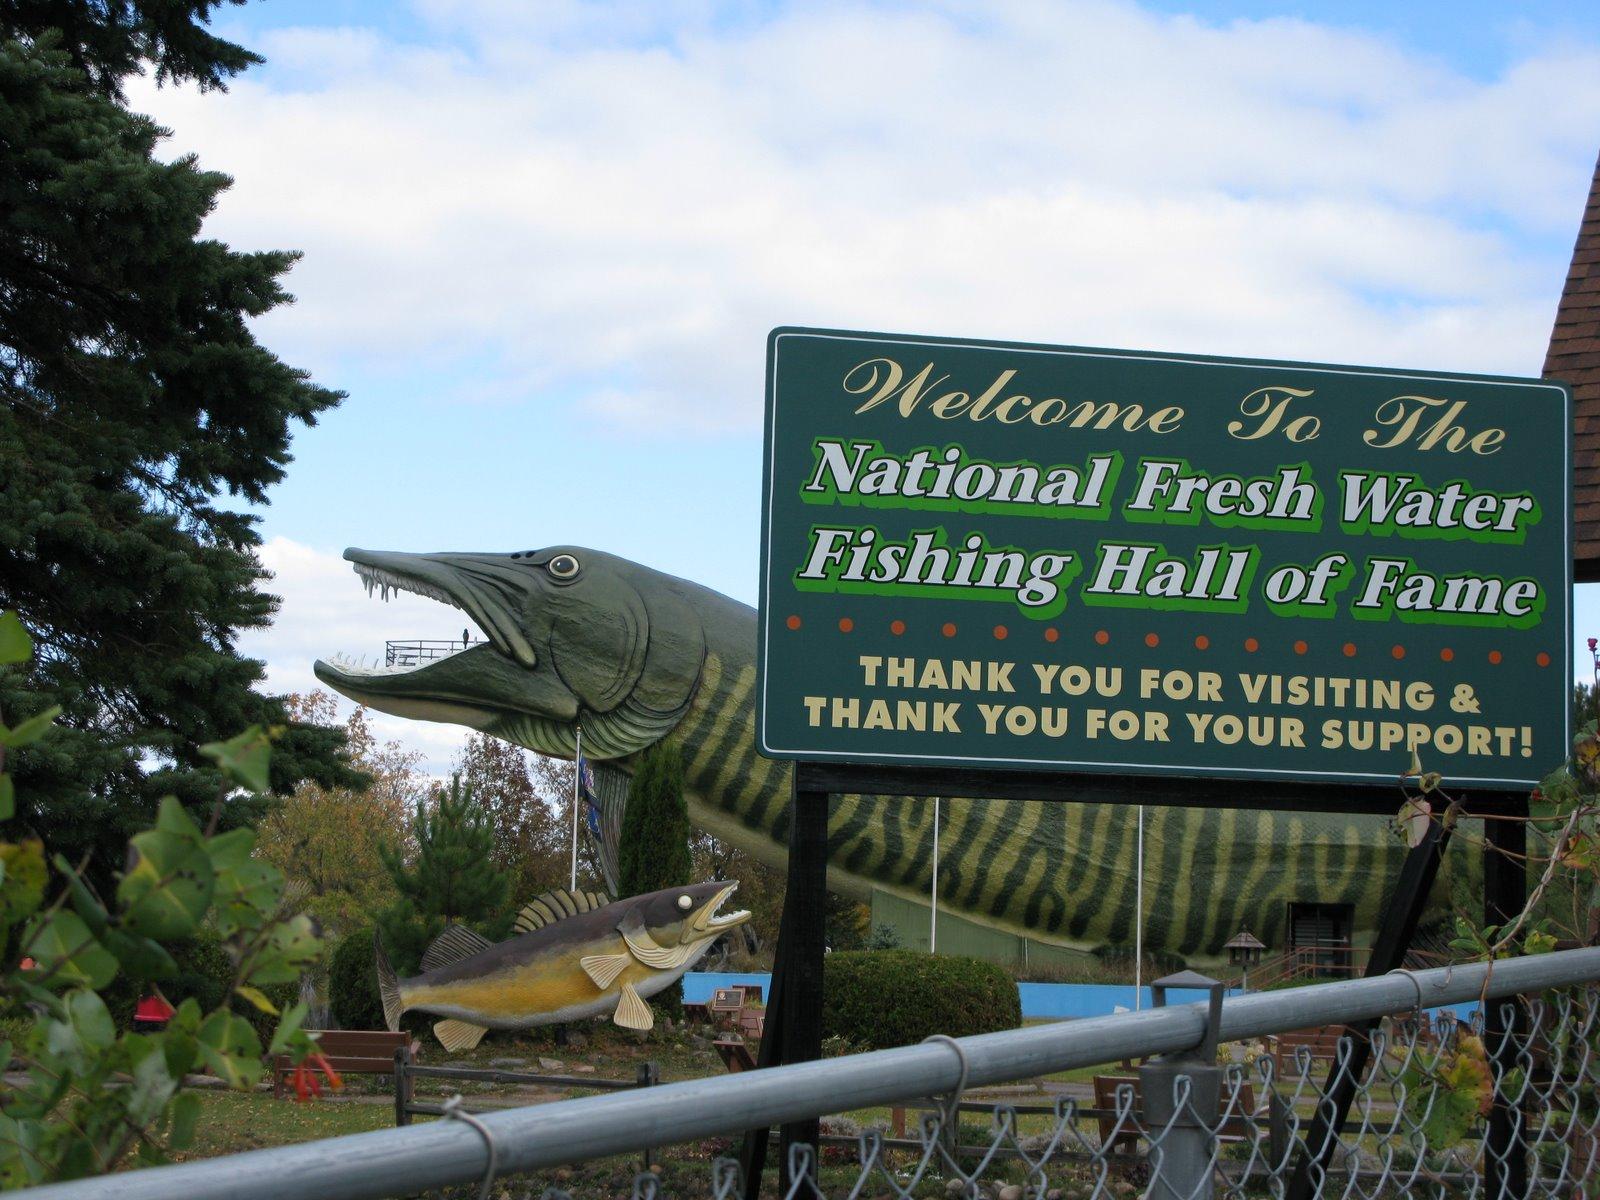 National fresh water fishing hall of fame rebecca dale for Freshwater fishing hall of fame